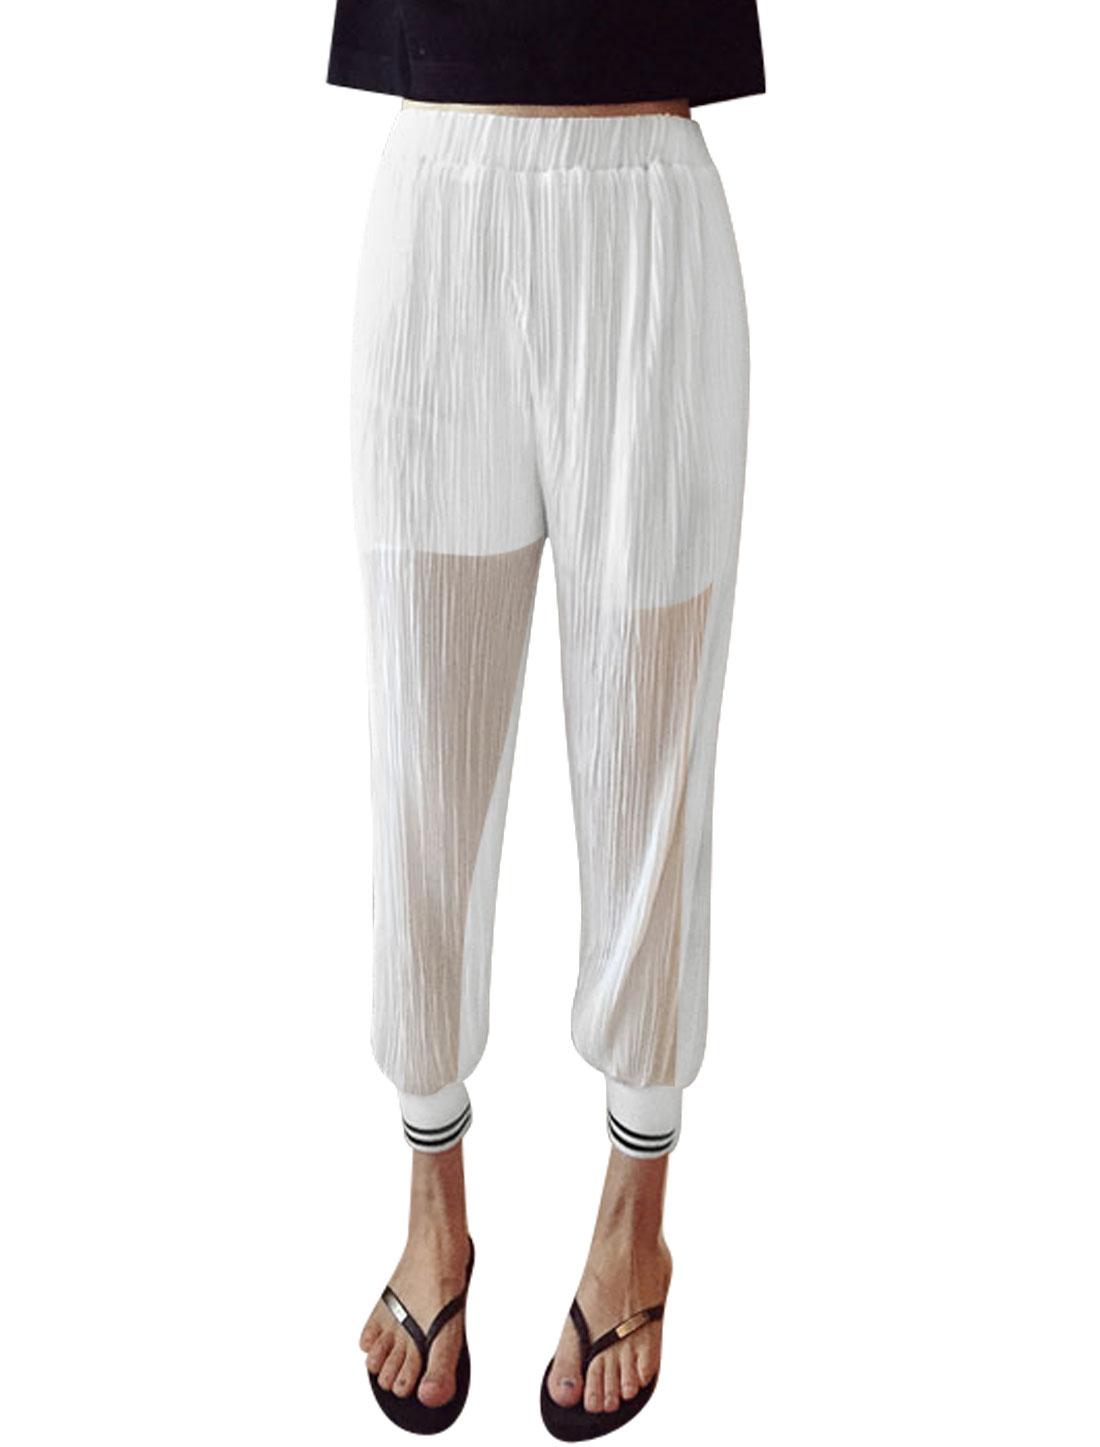 Women Elastic Waist Semi Sheer Partial Lined Chiffon Trousers White XS